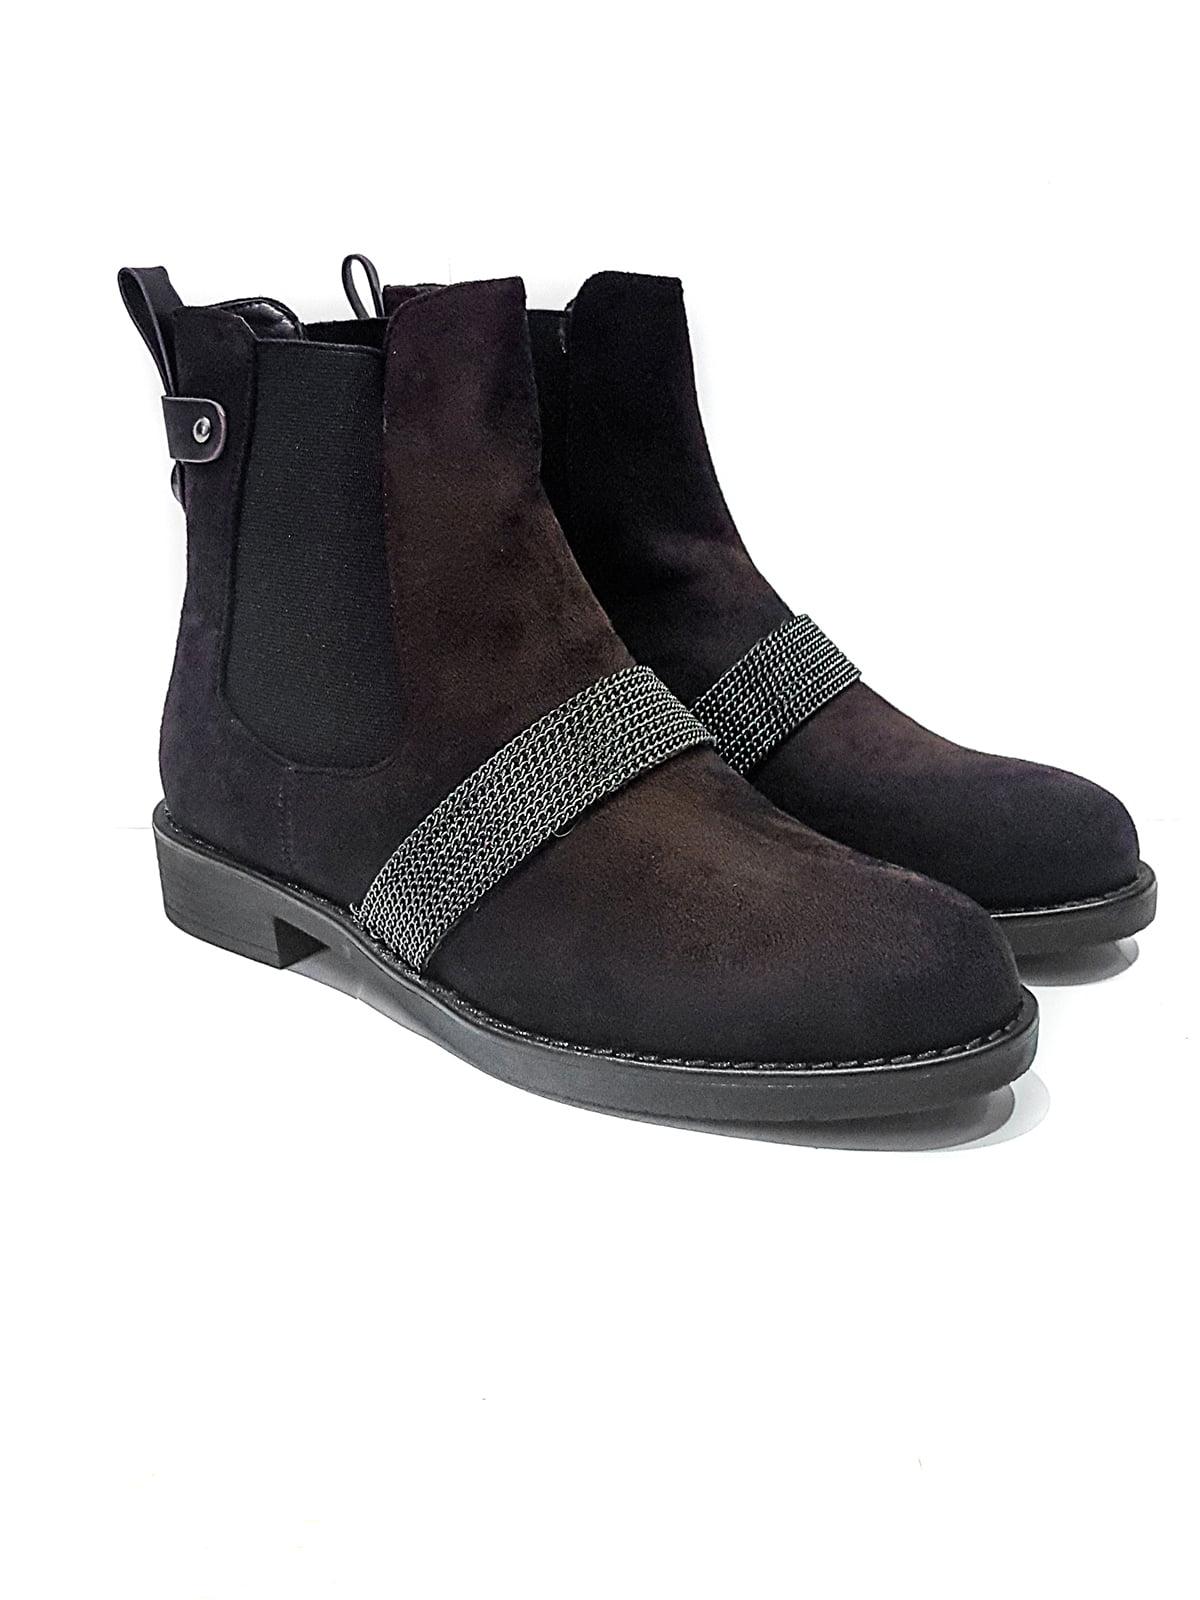 Ботинки коричневые   4445880